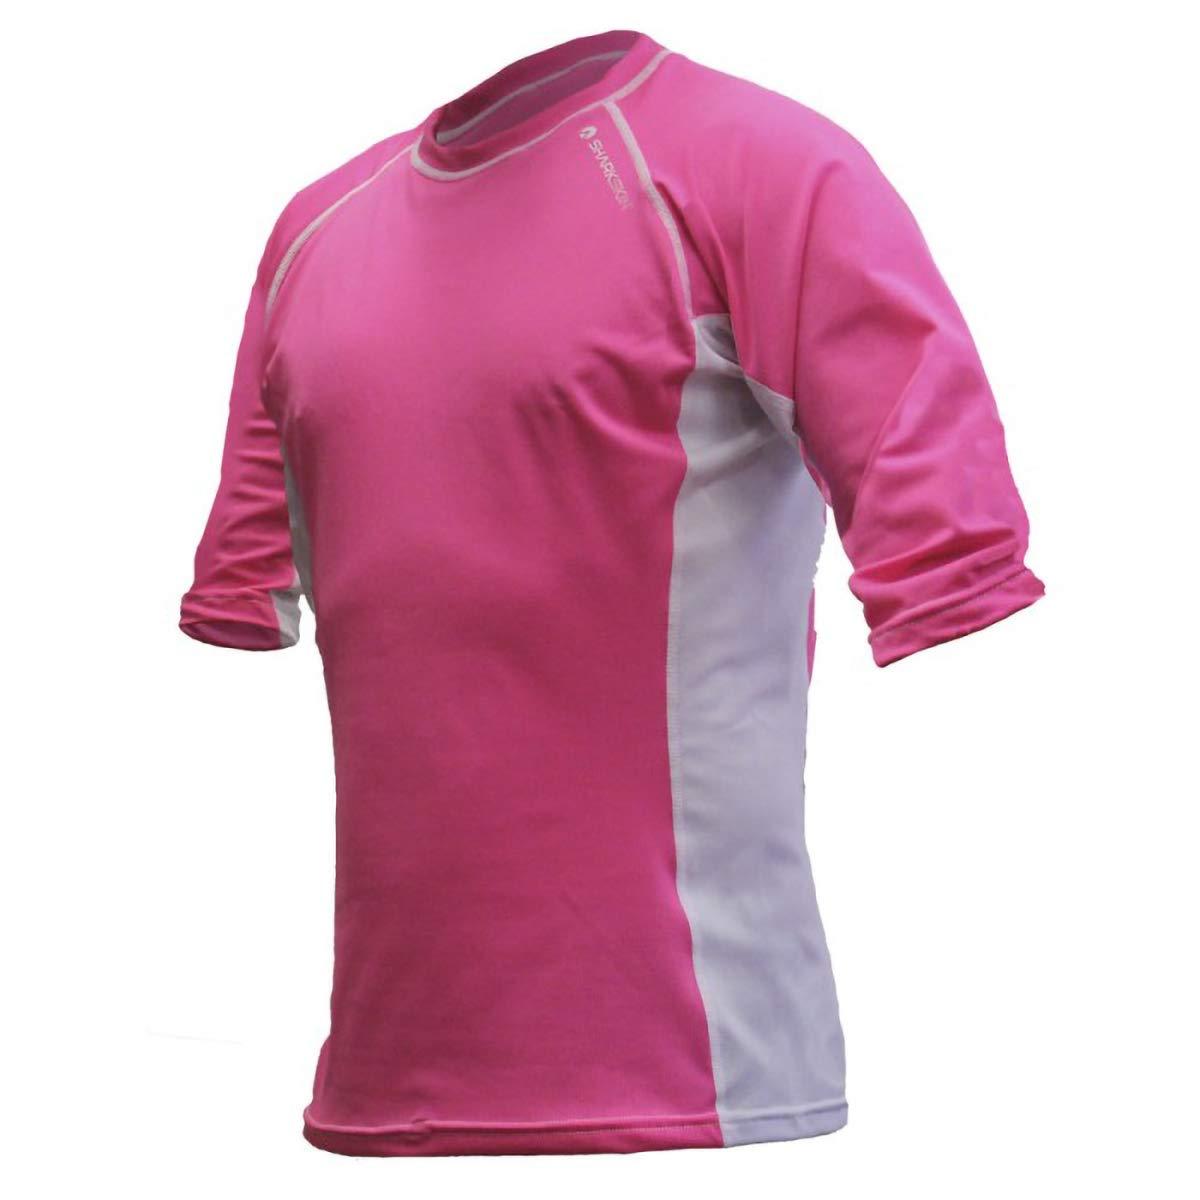 Sharkskin Rapid Dry Range Short Sleeve, Pink/White, Size: Medium by Sharkskin